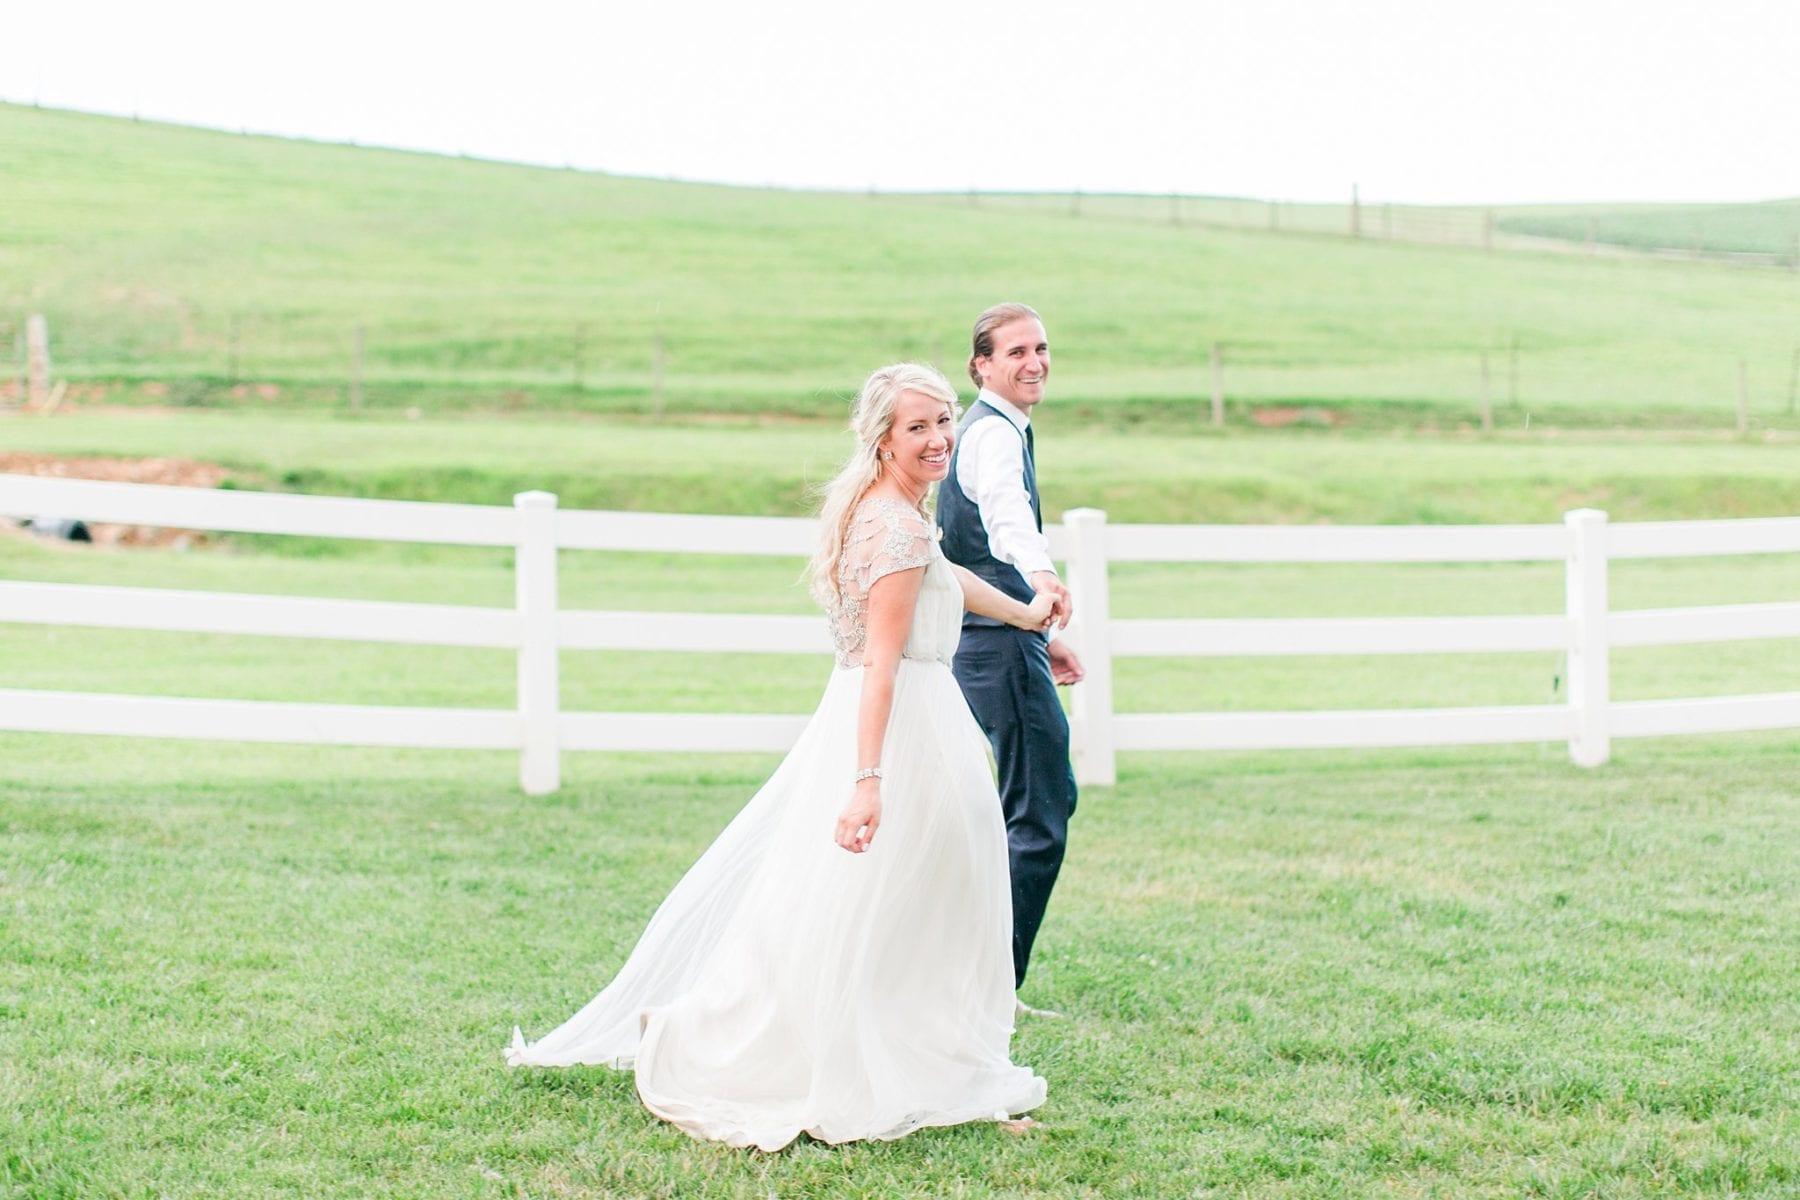 Pond View Farm Wedding Photos Maryland Wedding Photographer Kristen & Ryan Megan Kelsey Photography Blog-263.jpg